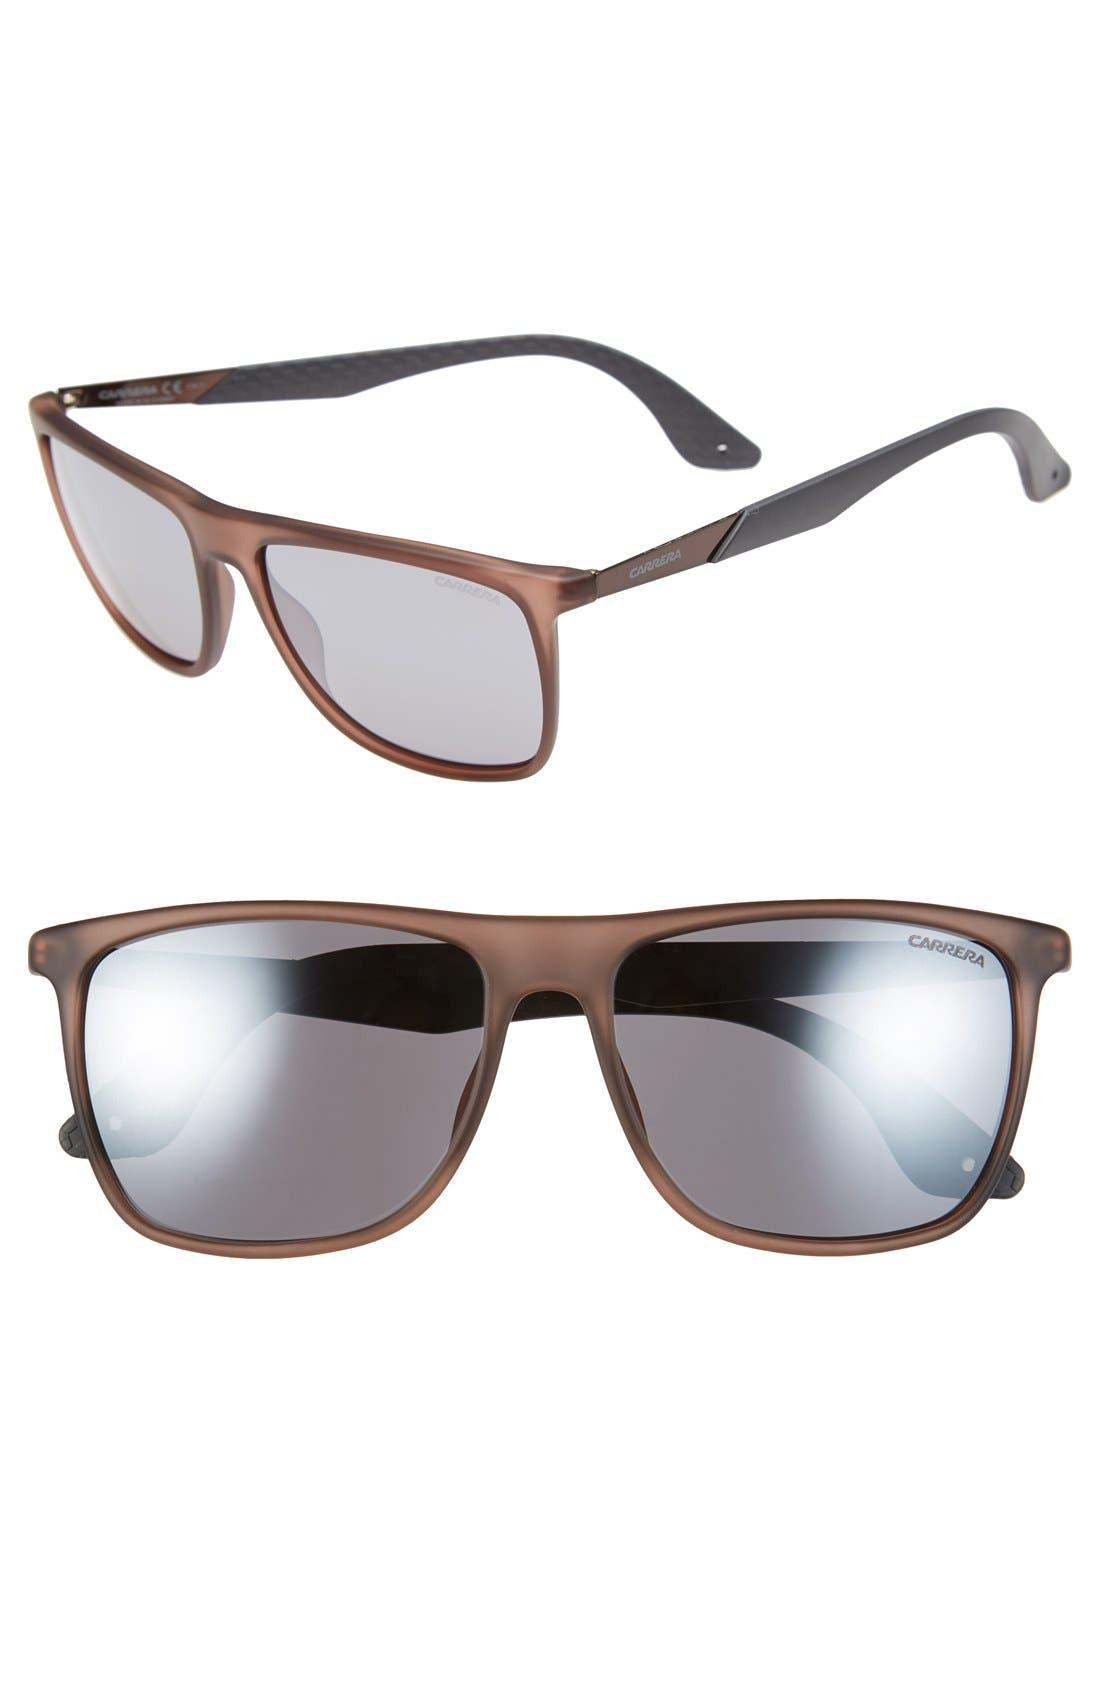 CARRERA EYEWEAR 56mm Retro Sunglasses, Main, color, MATTE BROWN/ GREY FLASH MIRROR